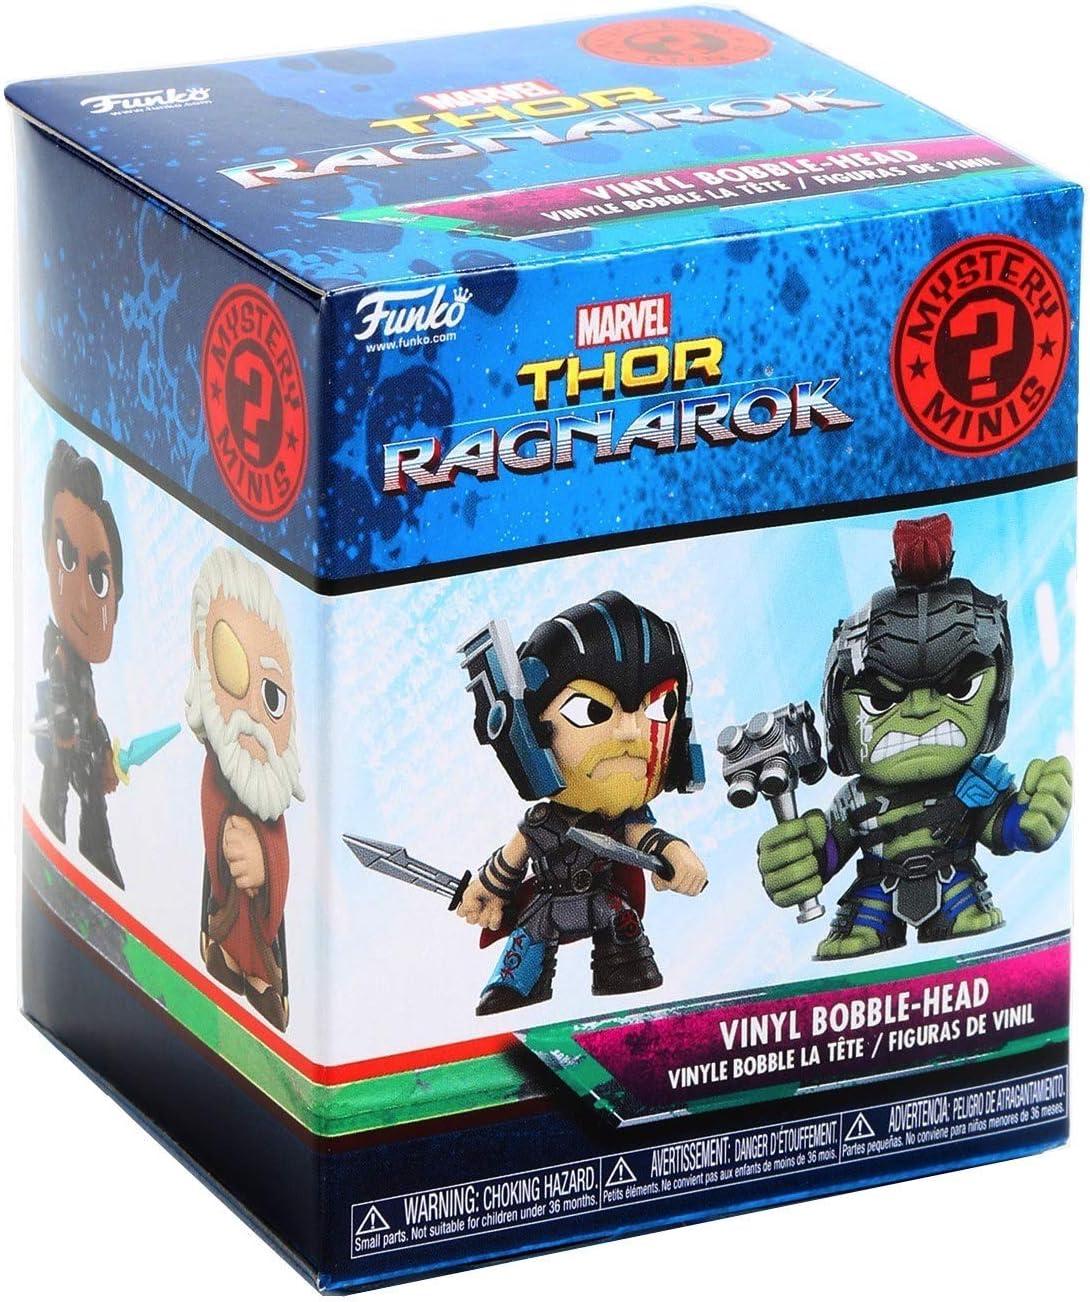 CHOOSE YOUR CHARACTER Marvel Thor Ragnarok Funko Pop Mystery Mini Figure